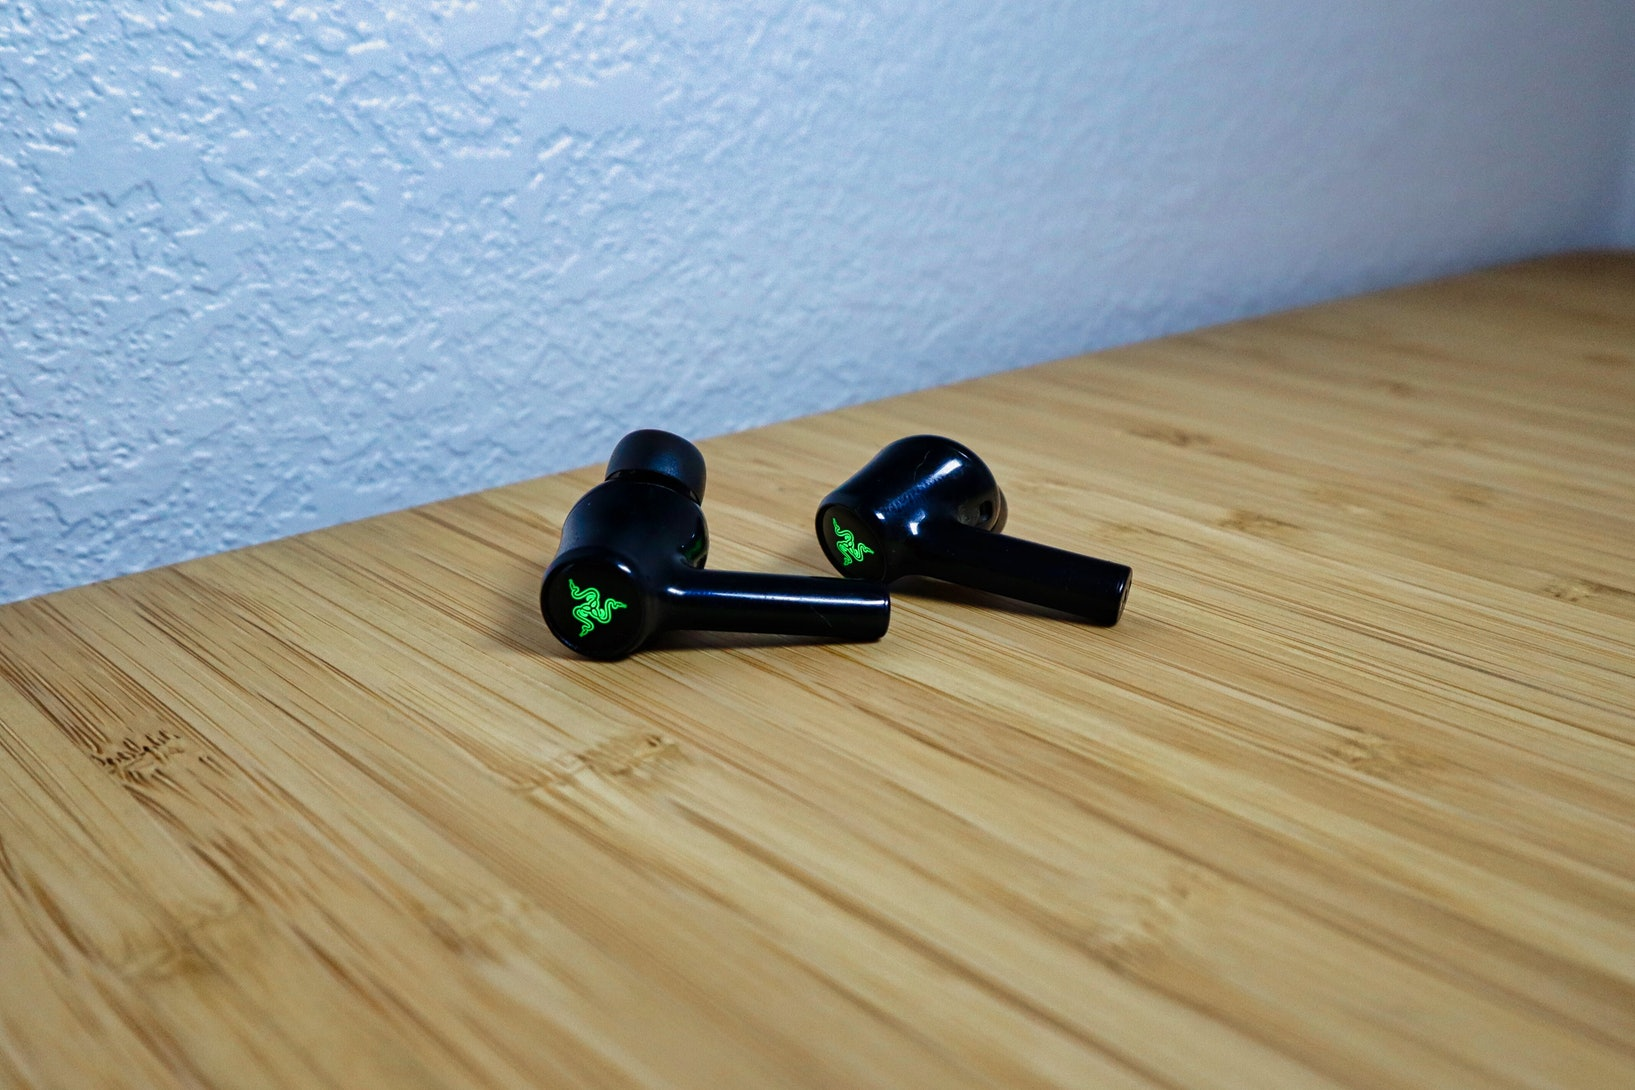 Razer Hammerhead True Wireless Earbuds for smartphones